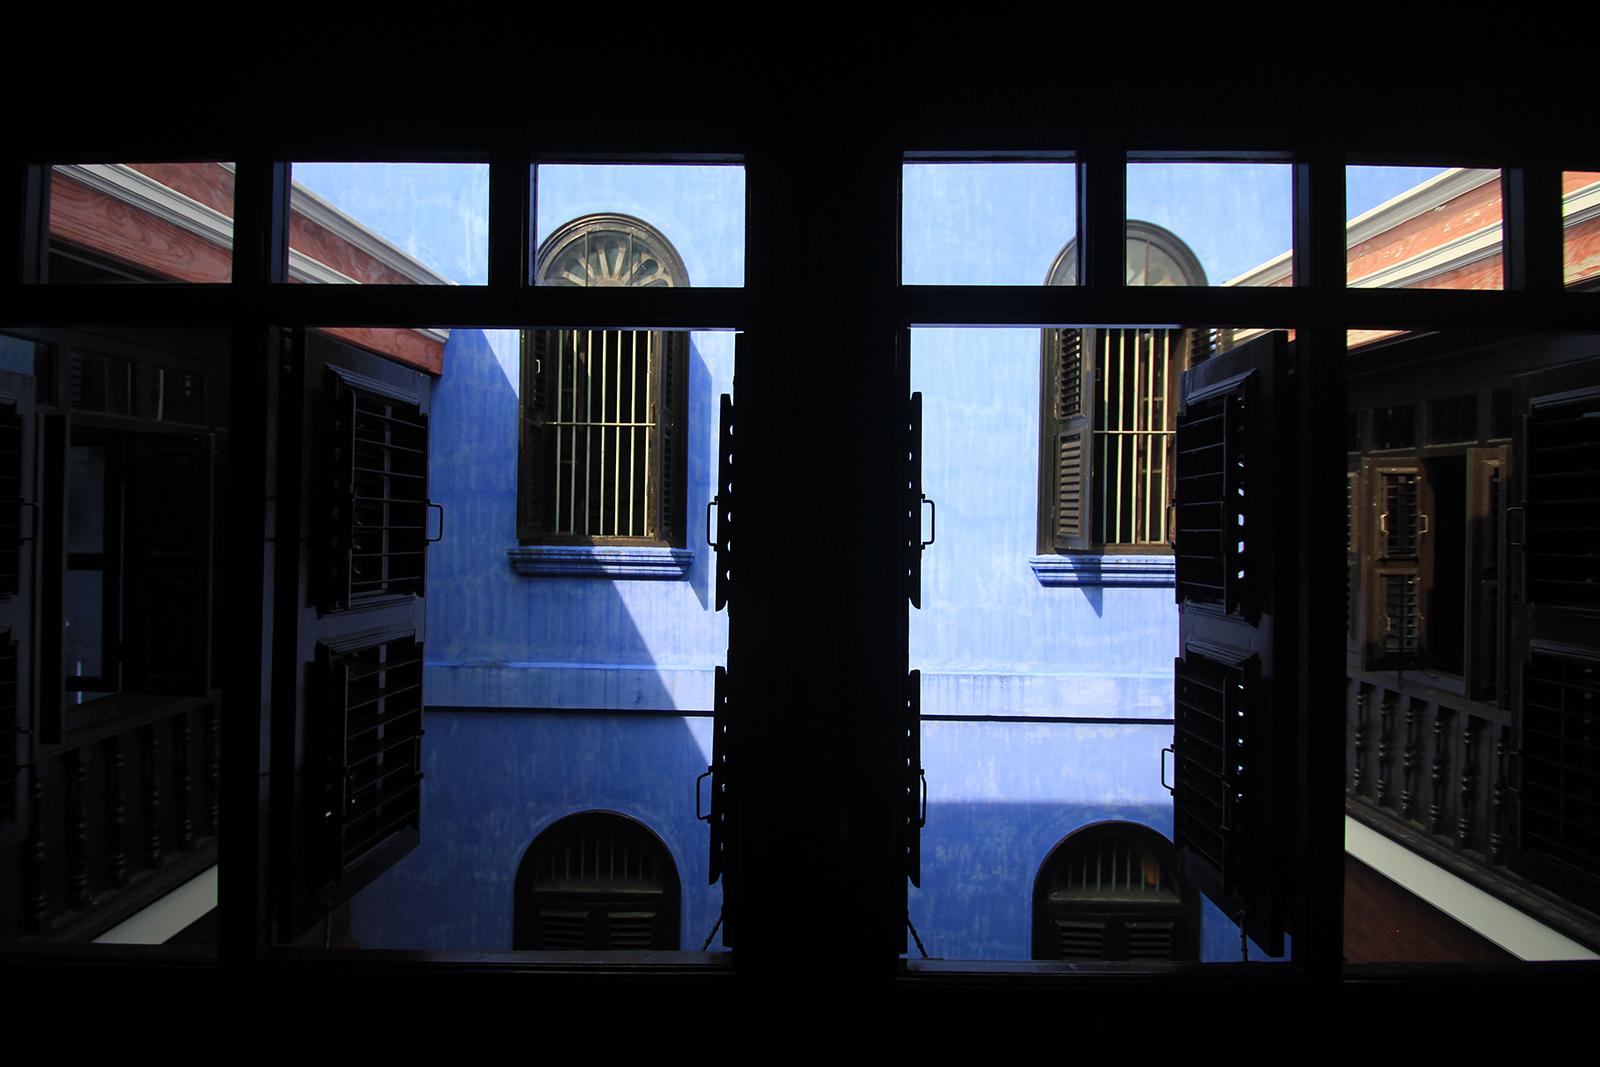 boutique-hotel-penang-island-blue-mansion-architecture-19 Architecture